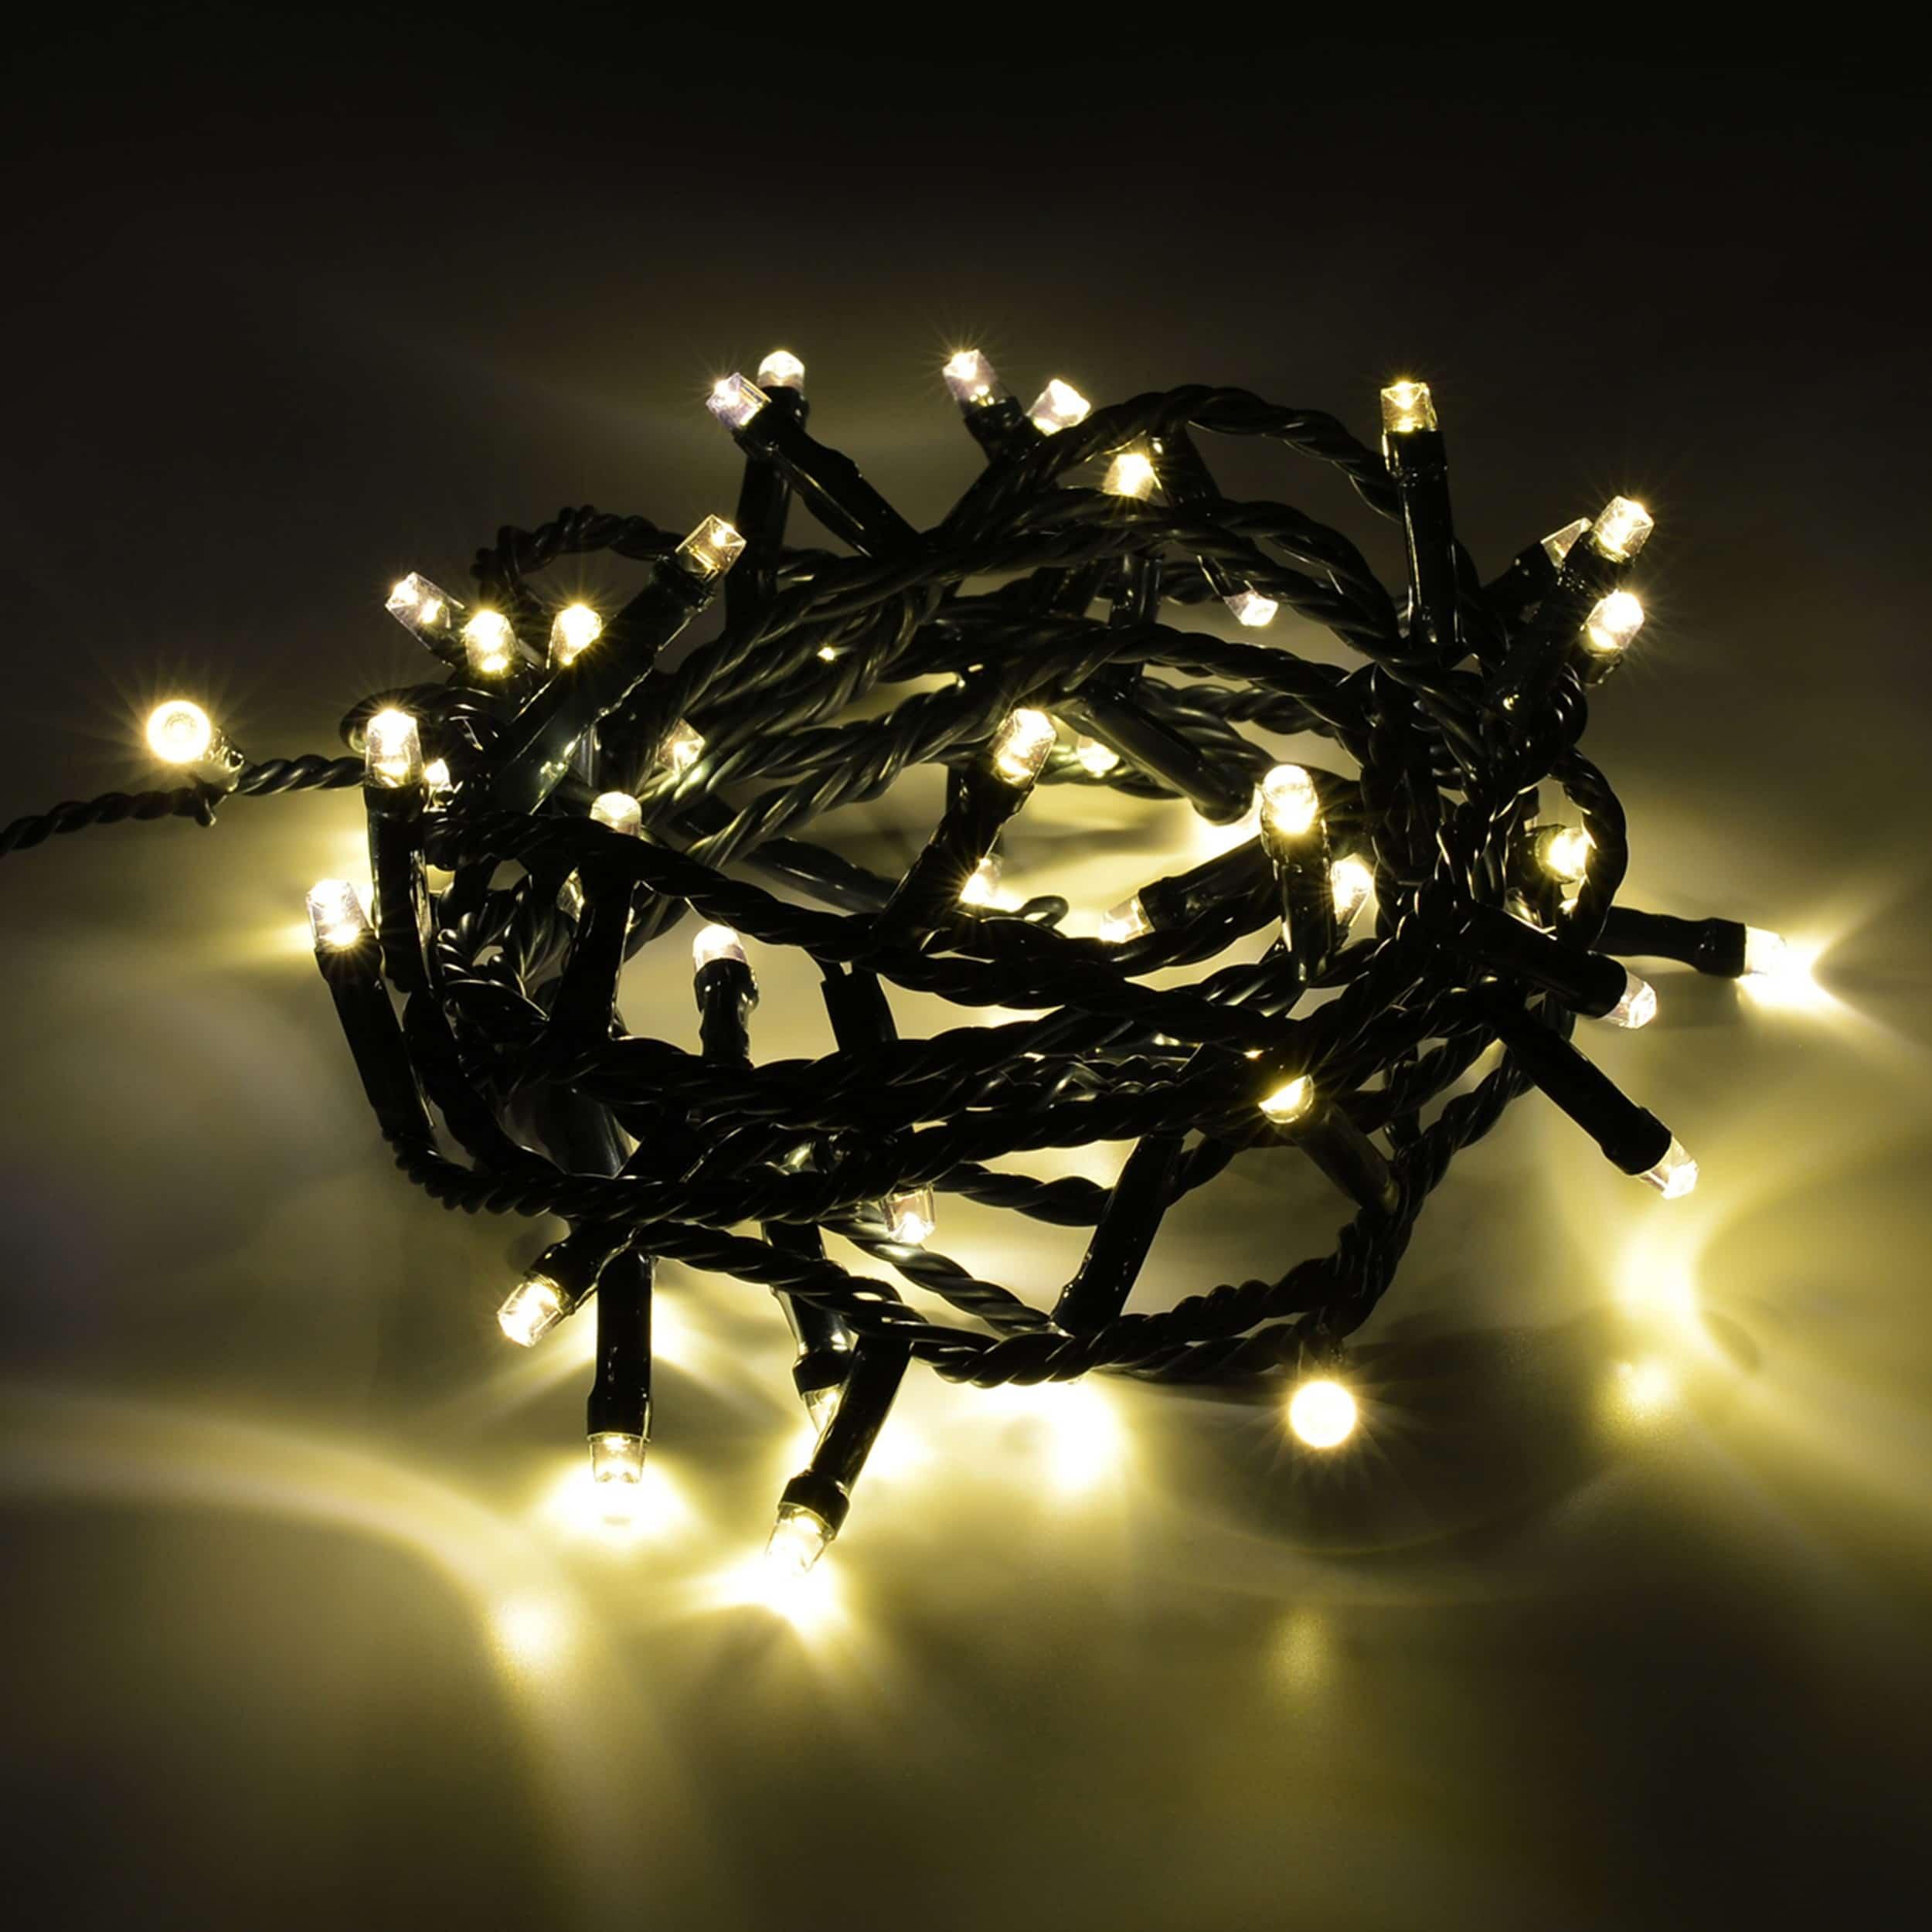 LED Lichterkette 50 LED energiesparend L250cm warmweiß